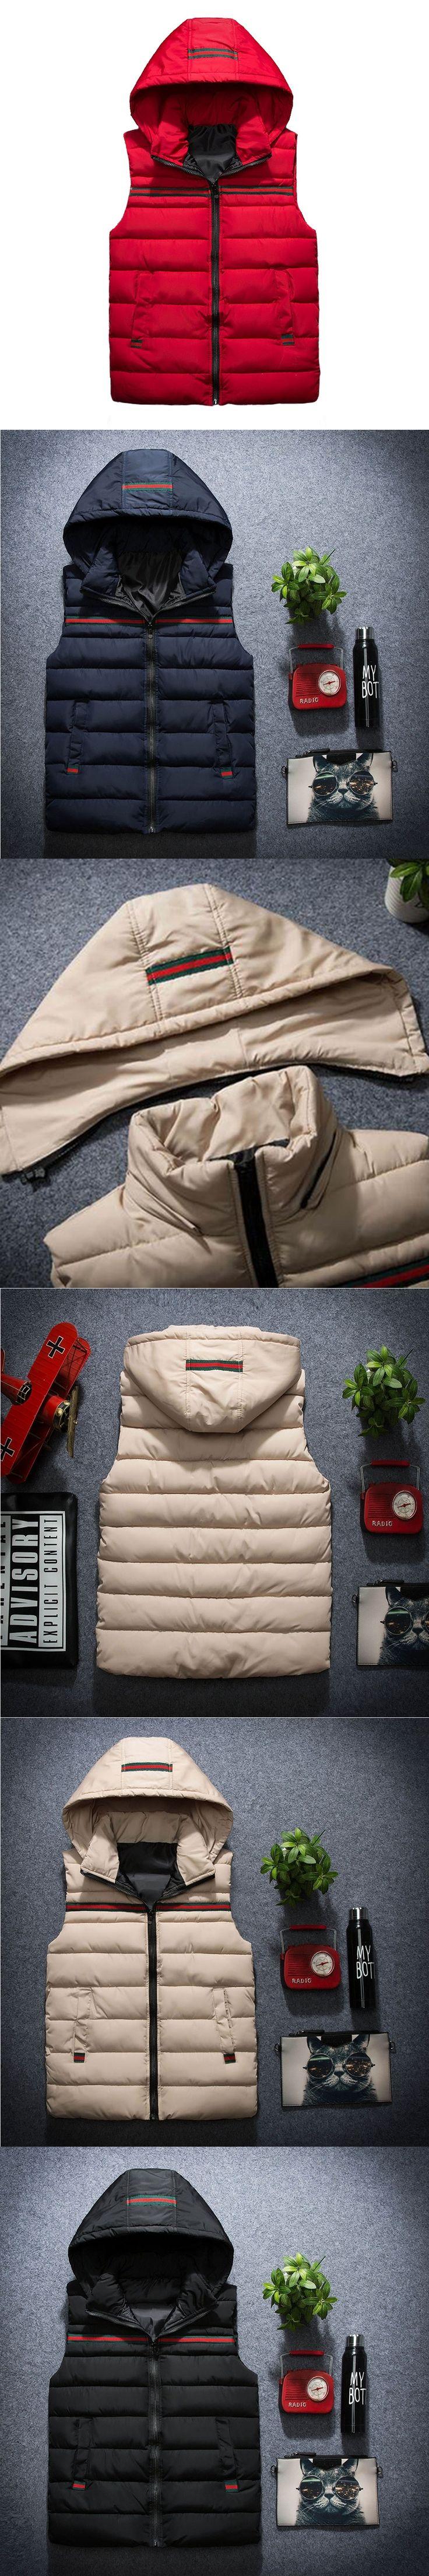 Vest Men Sleeveless Jacket Winter Fashion Striped Colete Male Hat Detachable Waistcoat Zipper Cotton-Padded Warm Gilet WS2104